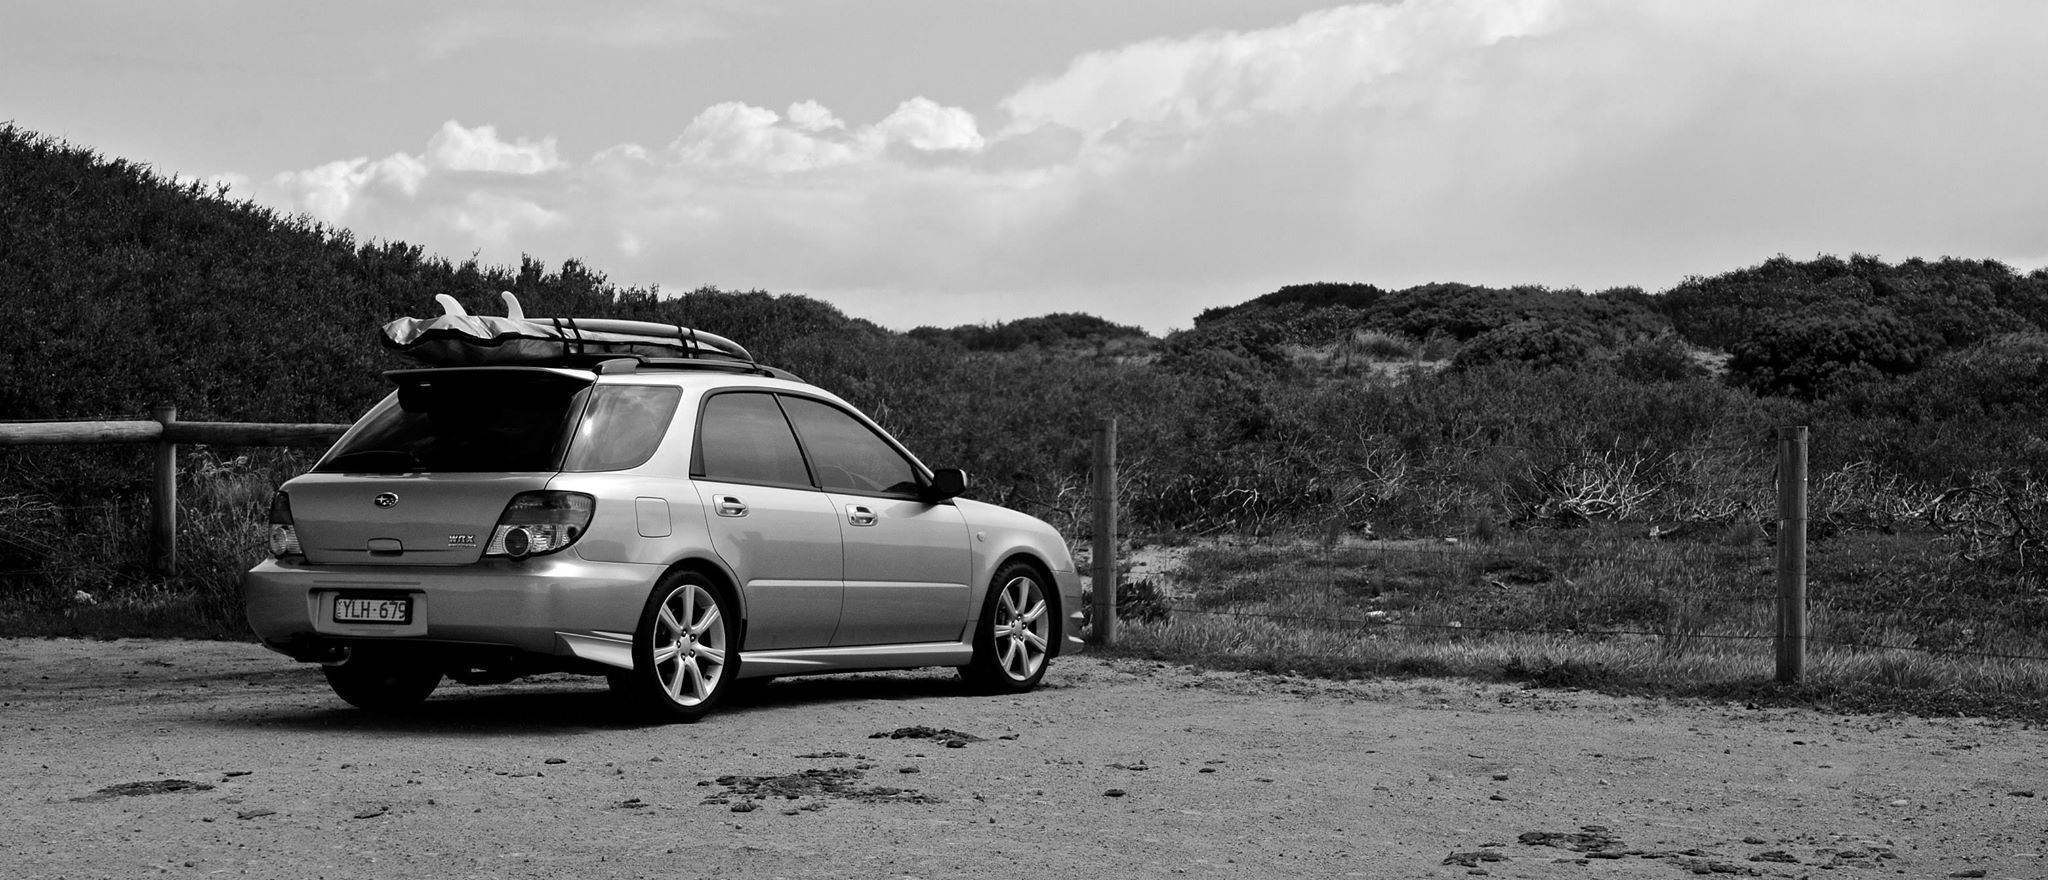 2006 subaru impreza wrx wagon at 13th beach australia cars 2006 subaru impreza wrx wagon at 13th beach australia vanachro Gallery